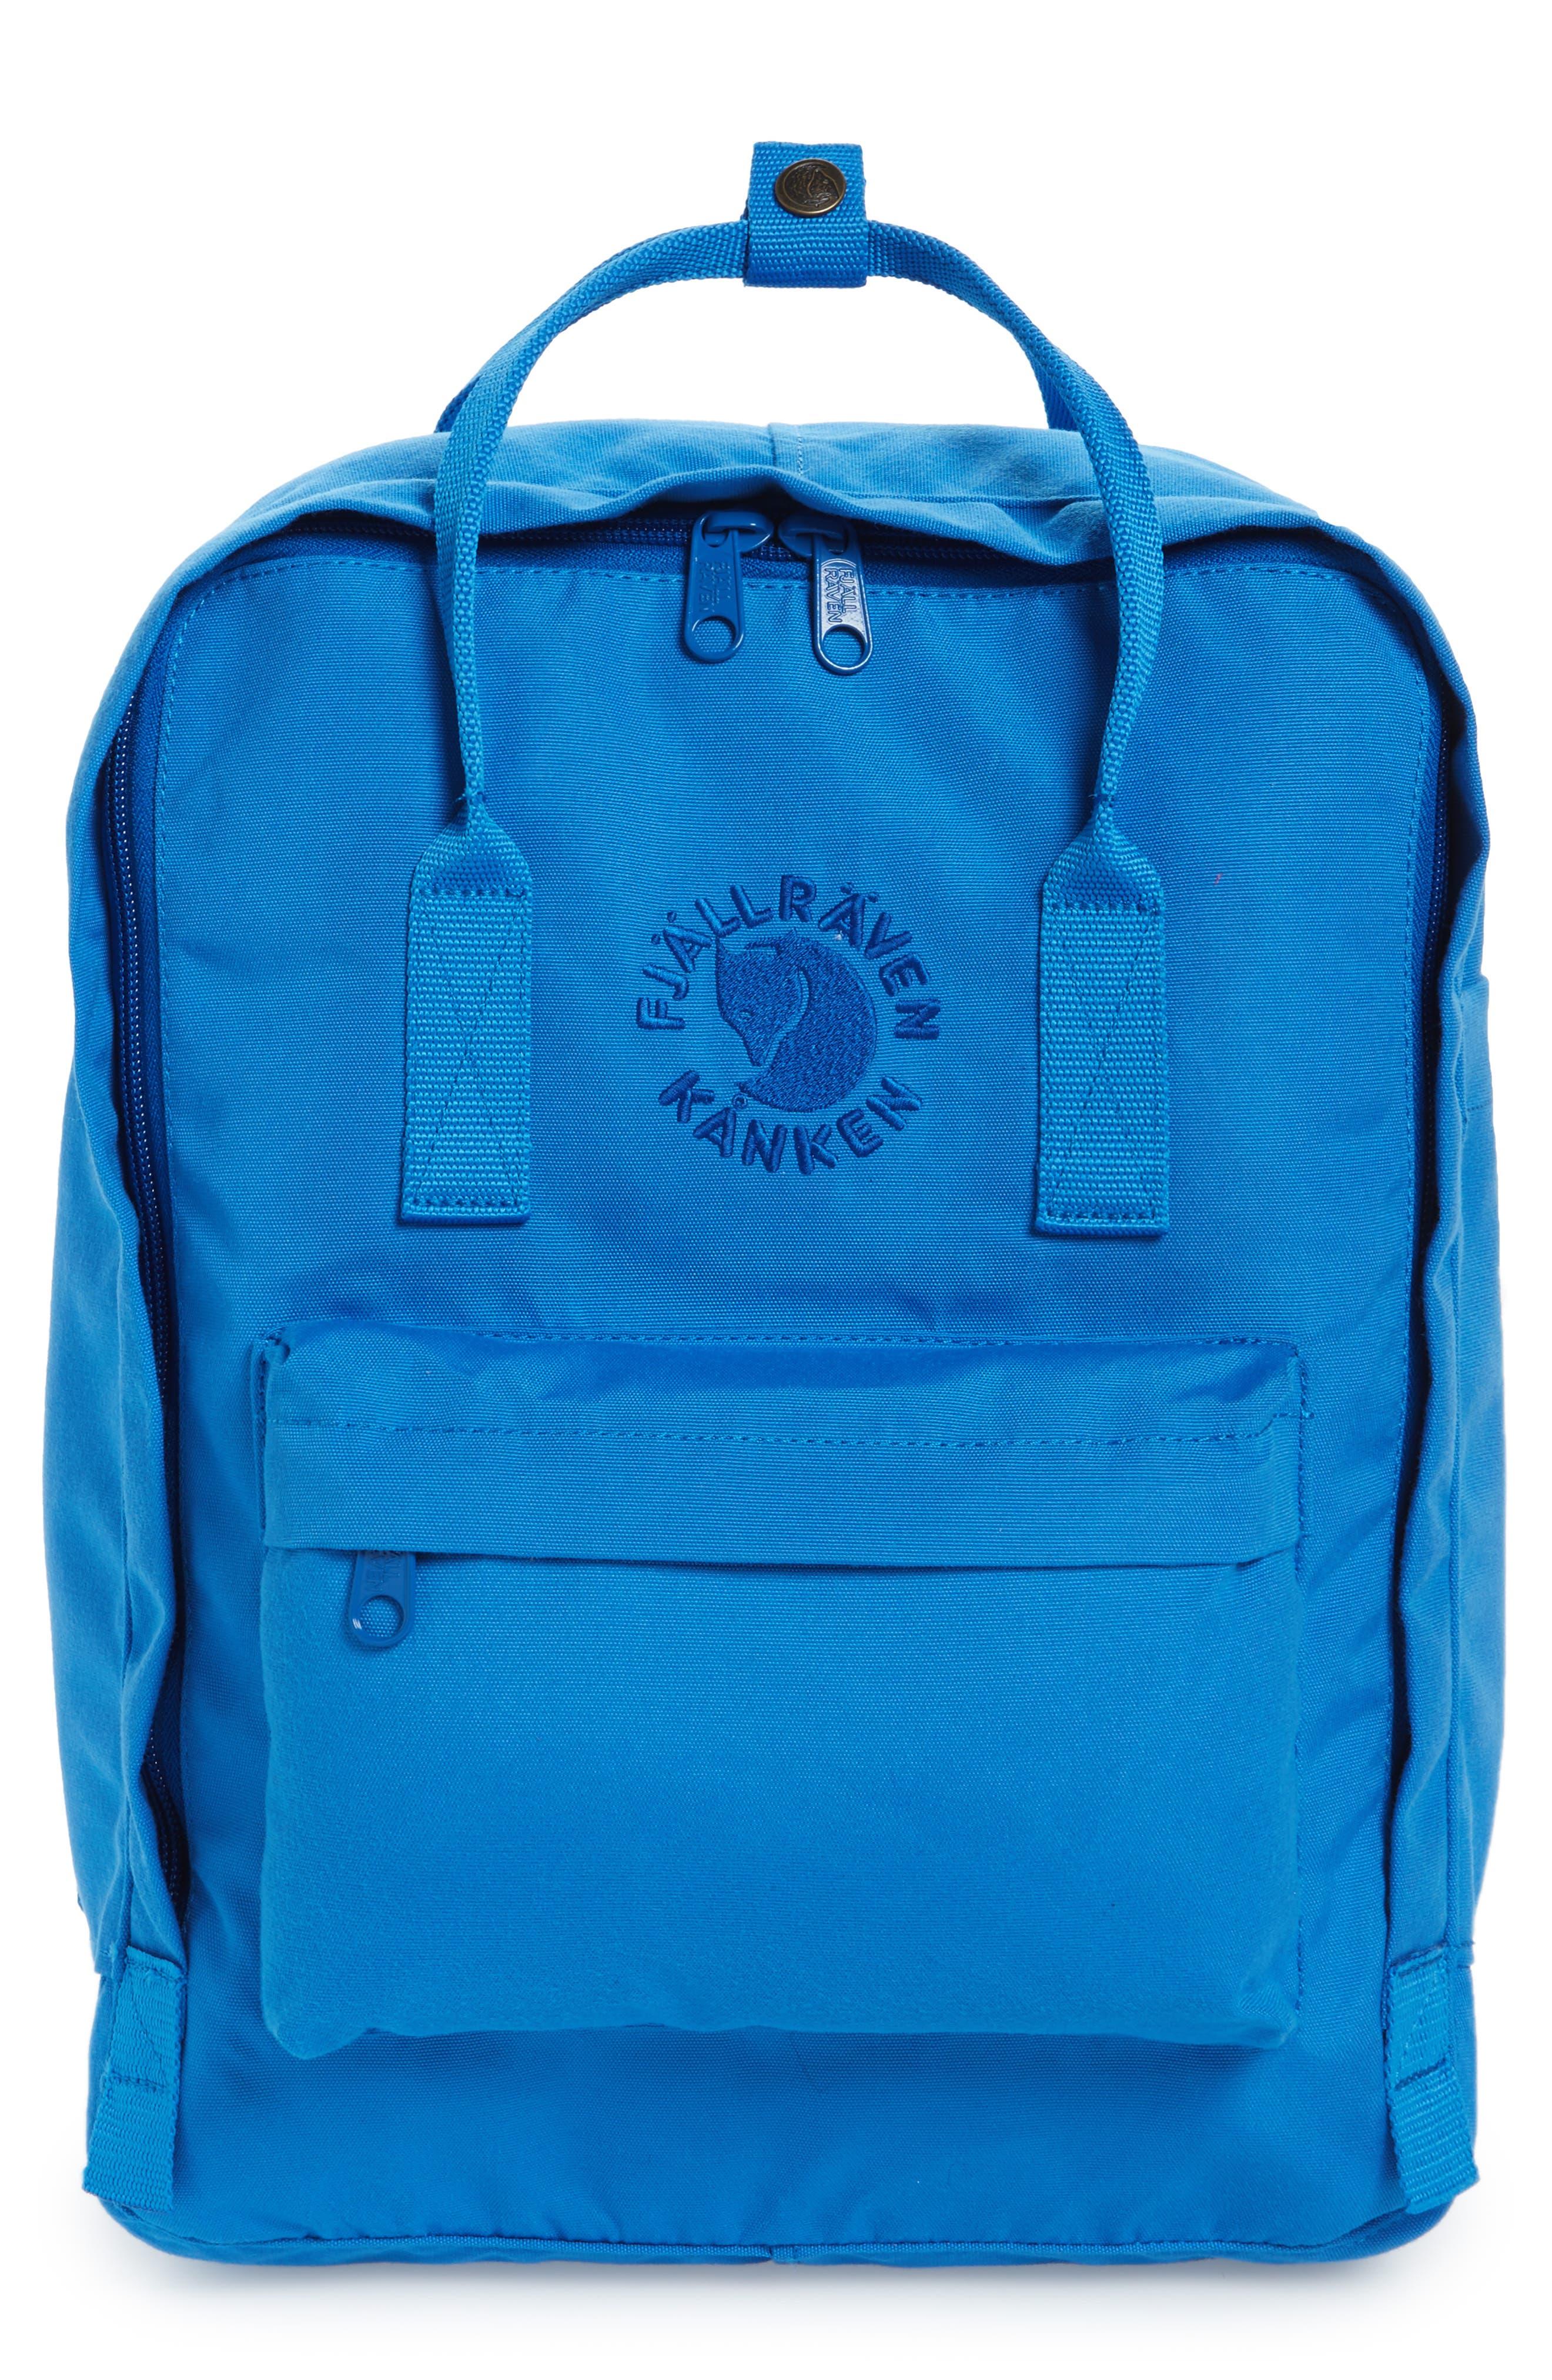 Re-Kånken Water Resistant Backpack,                         Main,                         color, UN BLUE